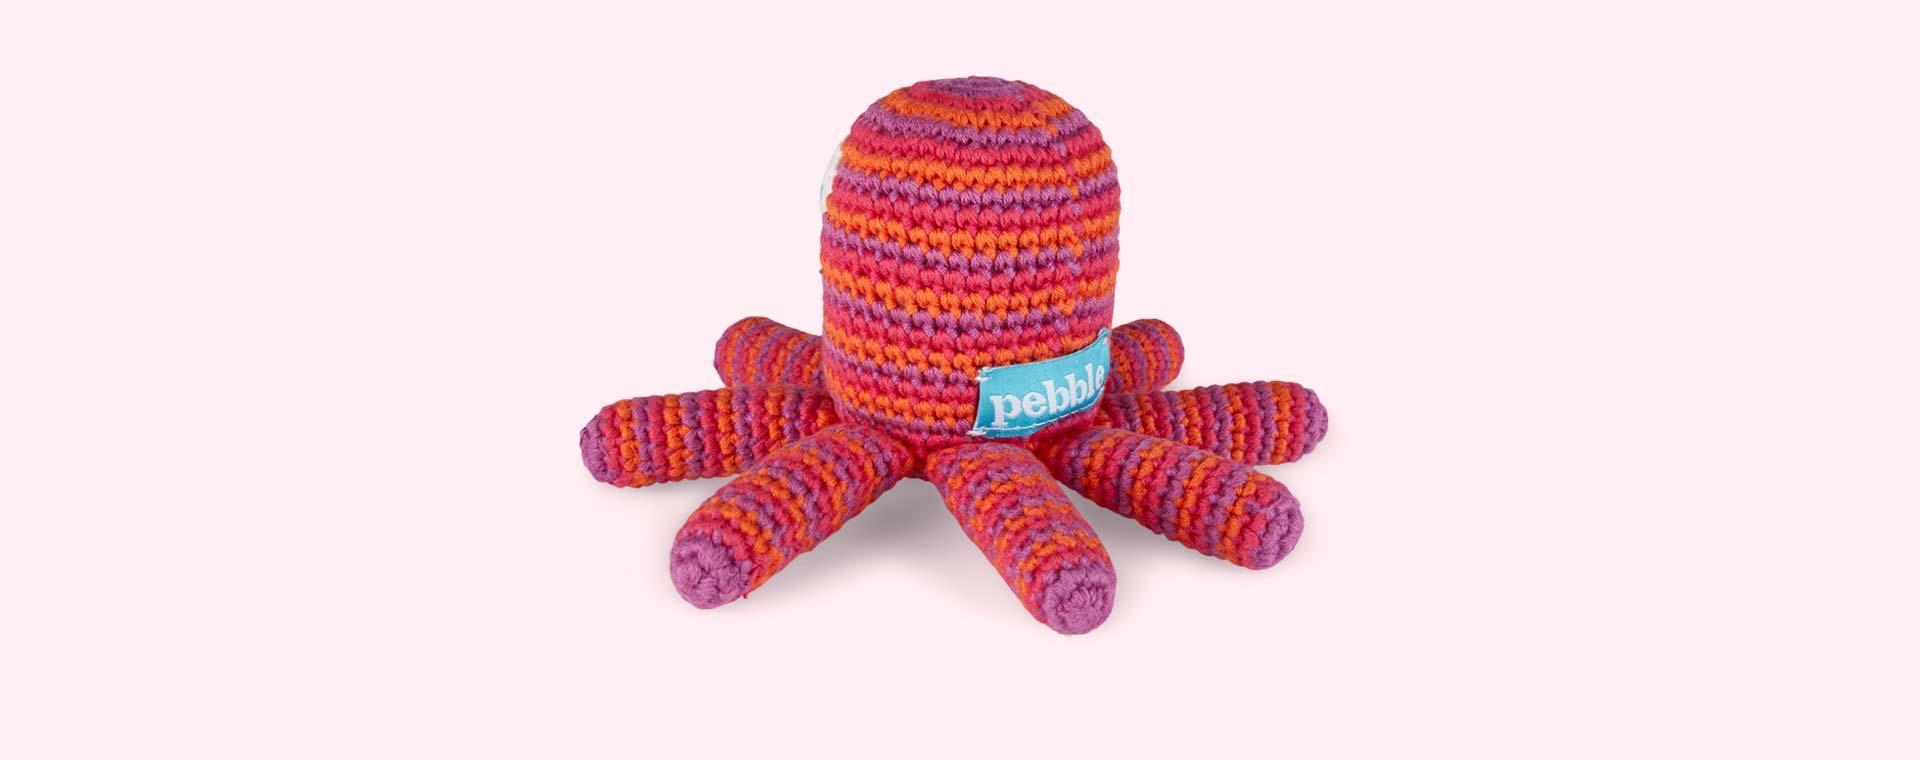 Pink Pebble Octopus Crochet Rattle